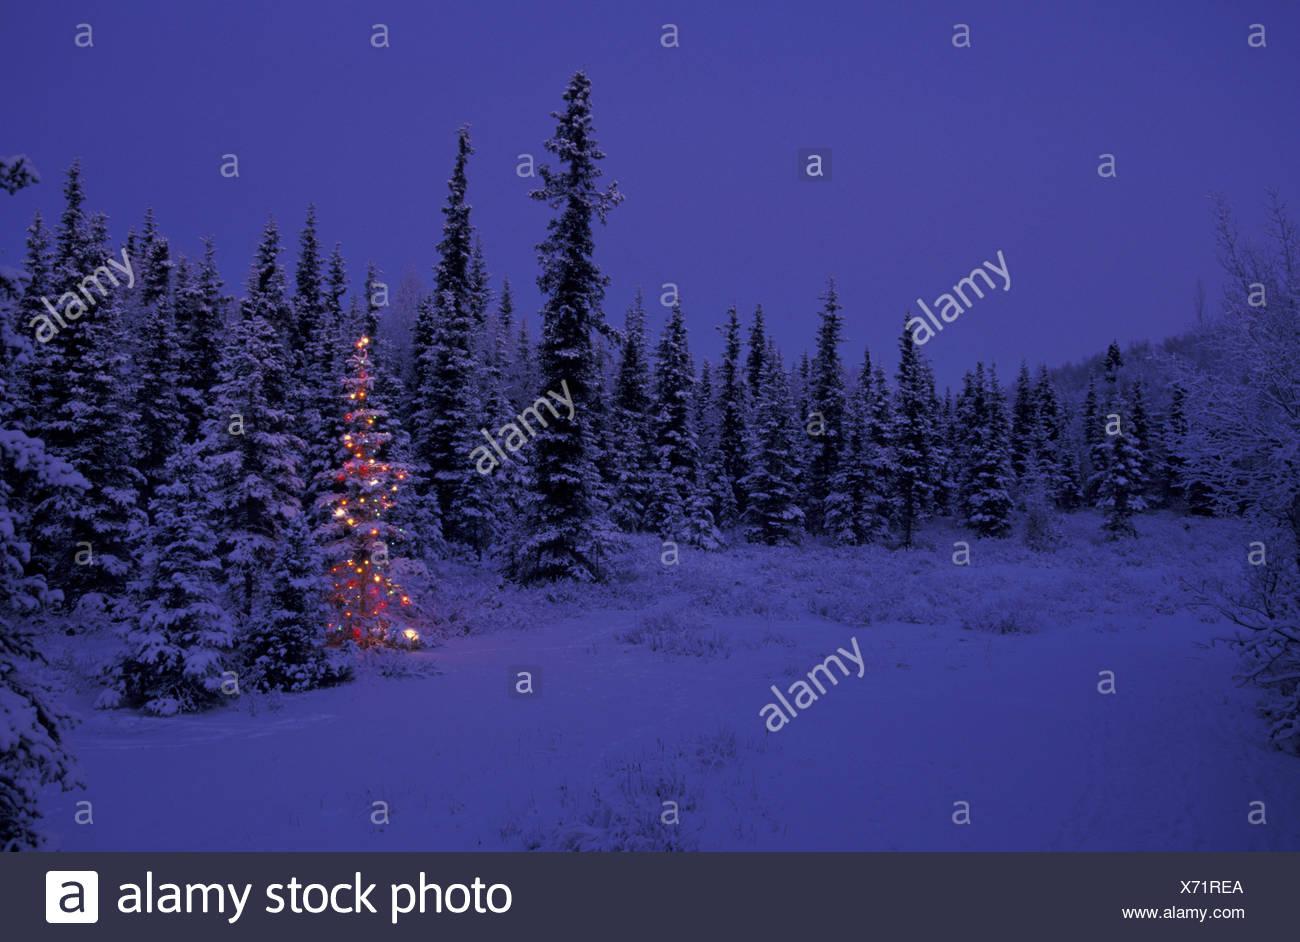 Christmas tree forest night stockfotos christmas tree for Beleuchteter tannenbaum